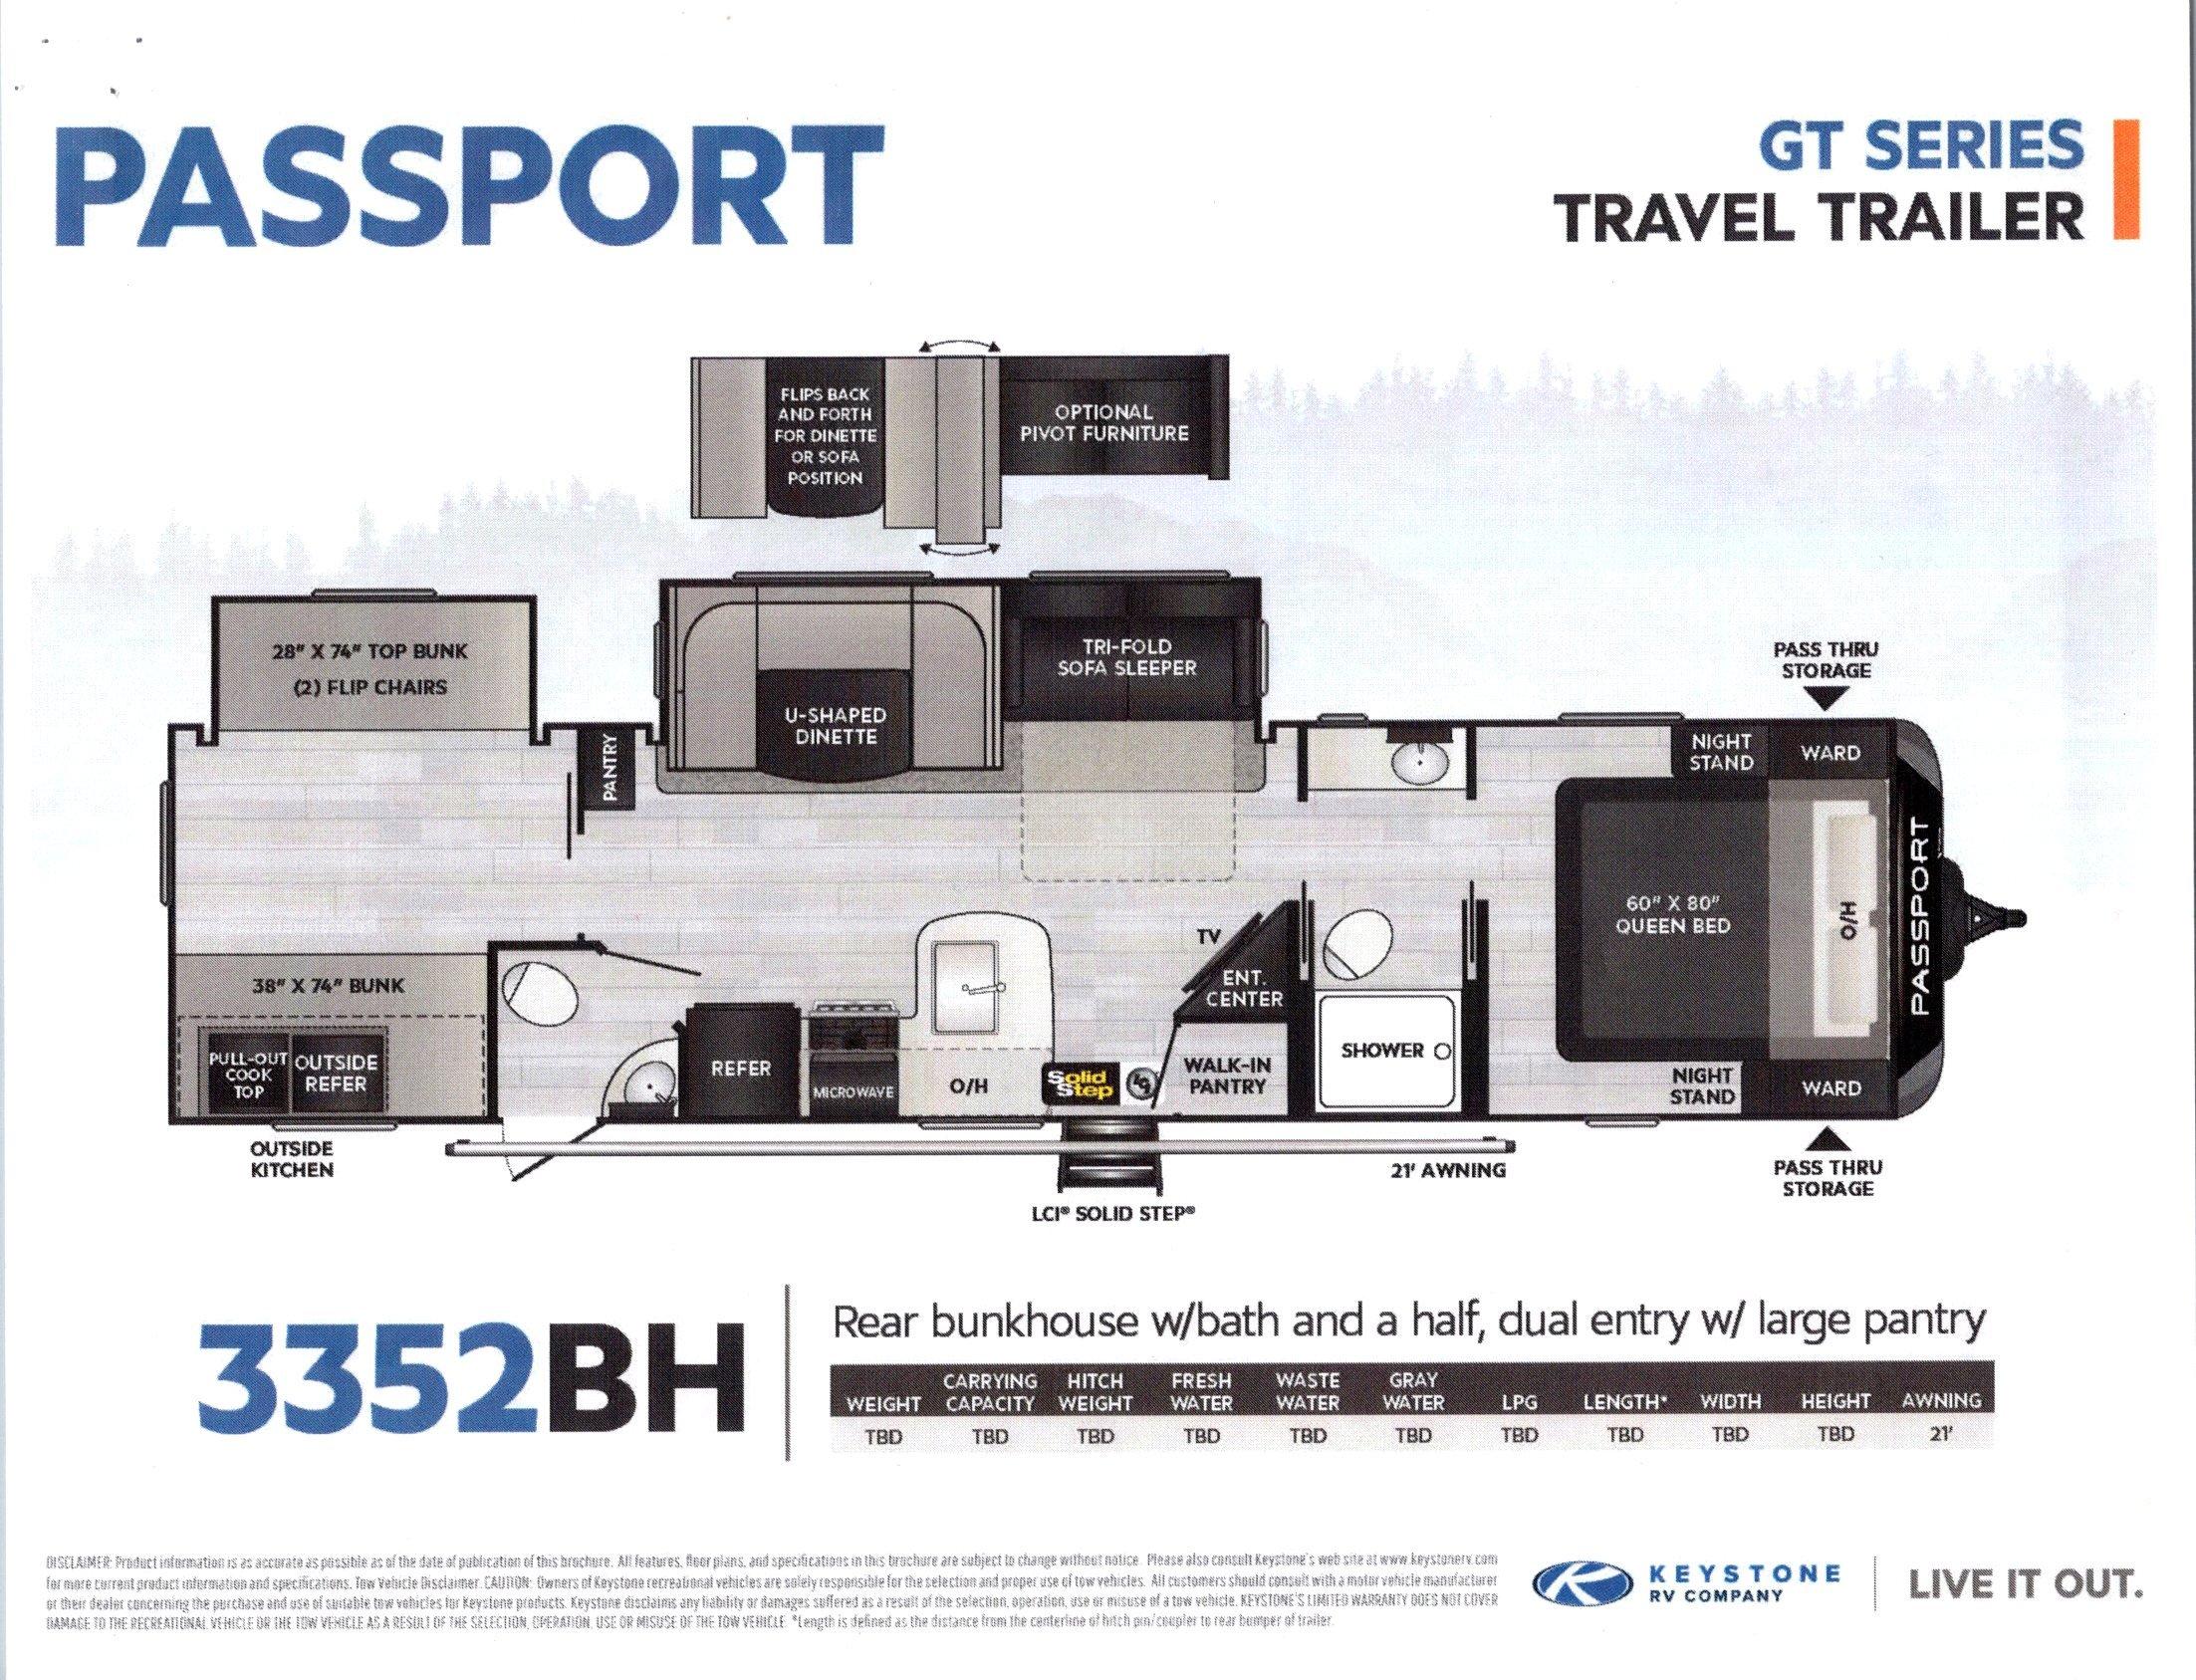 2021 Passport 3352BH GT Series